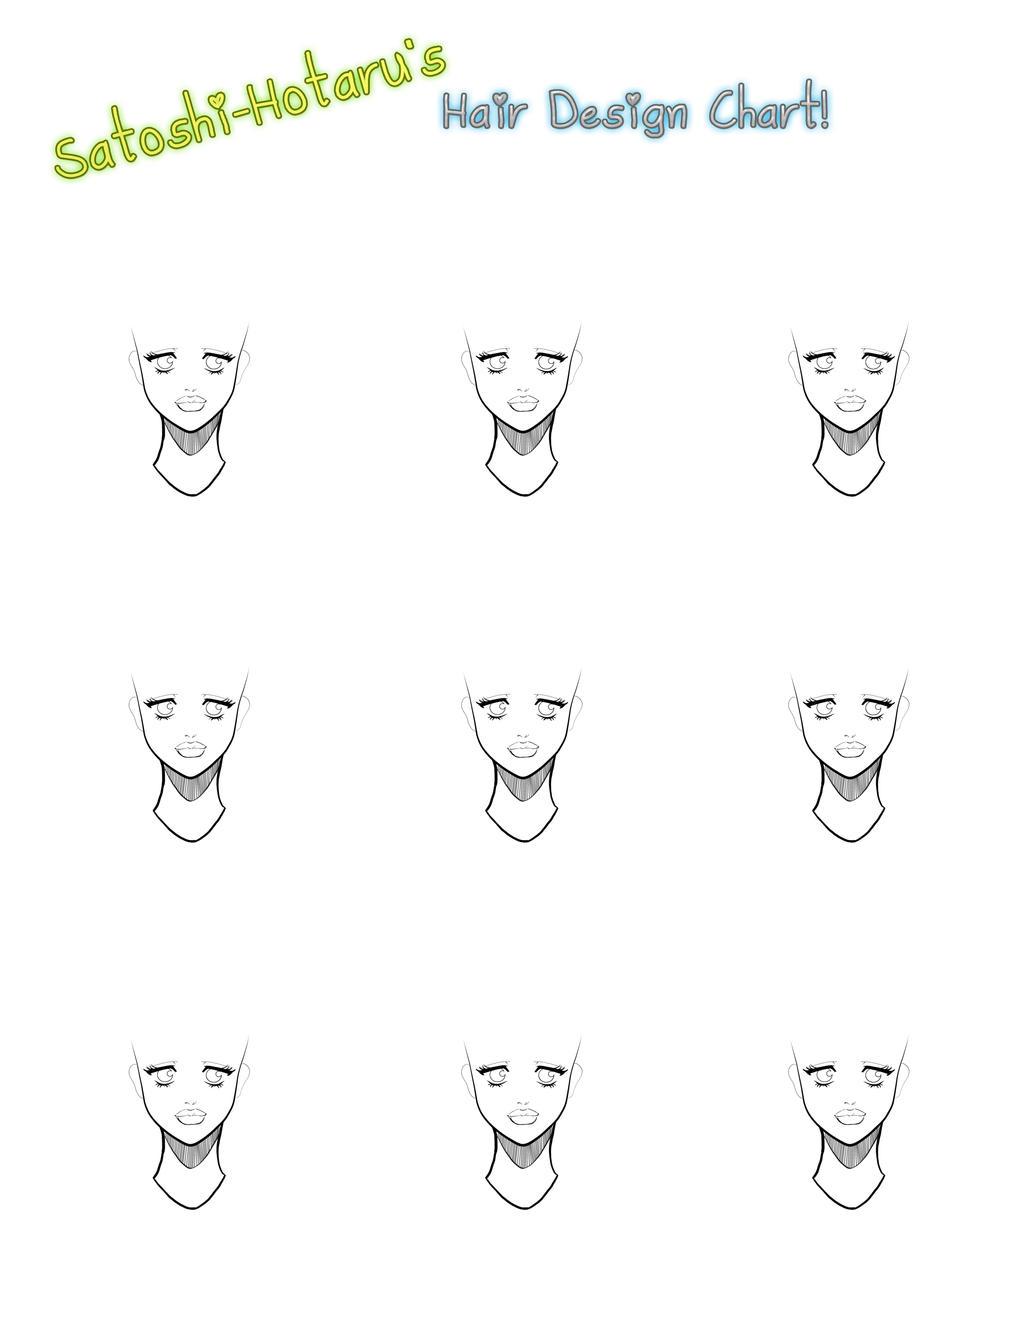 Character Design Format : Blank hair design sheet by satoshi hotaru on deviantart